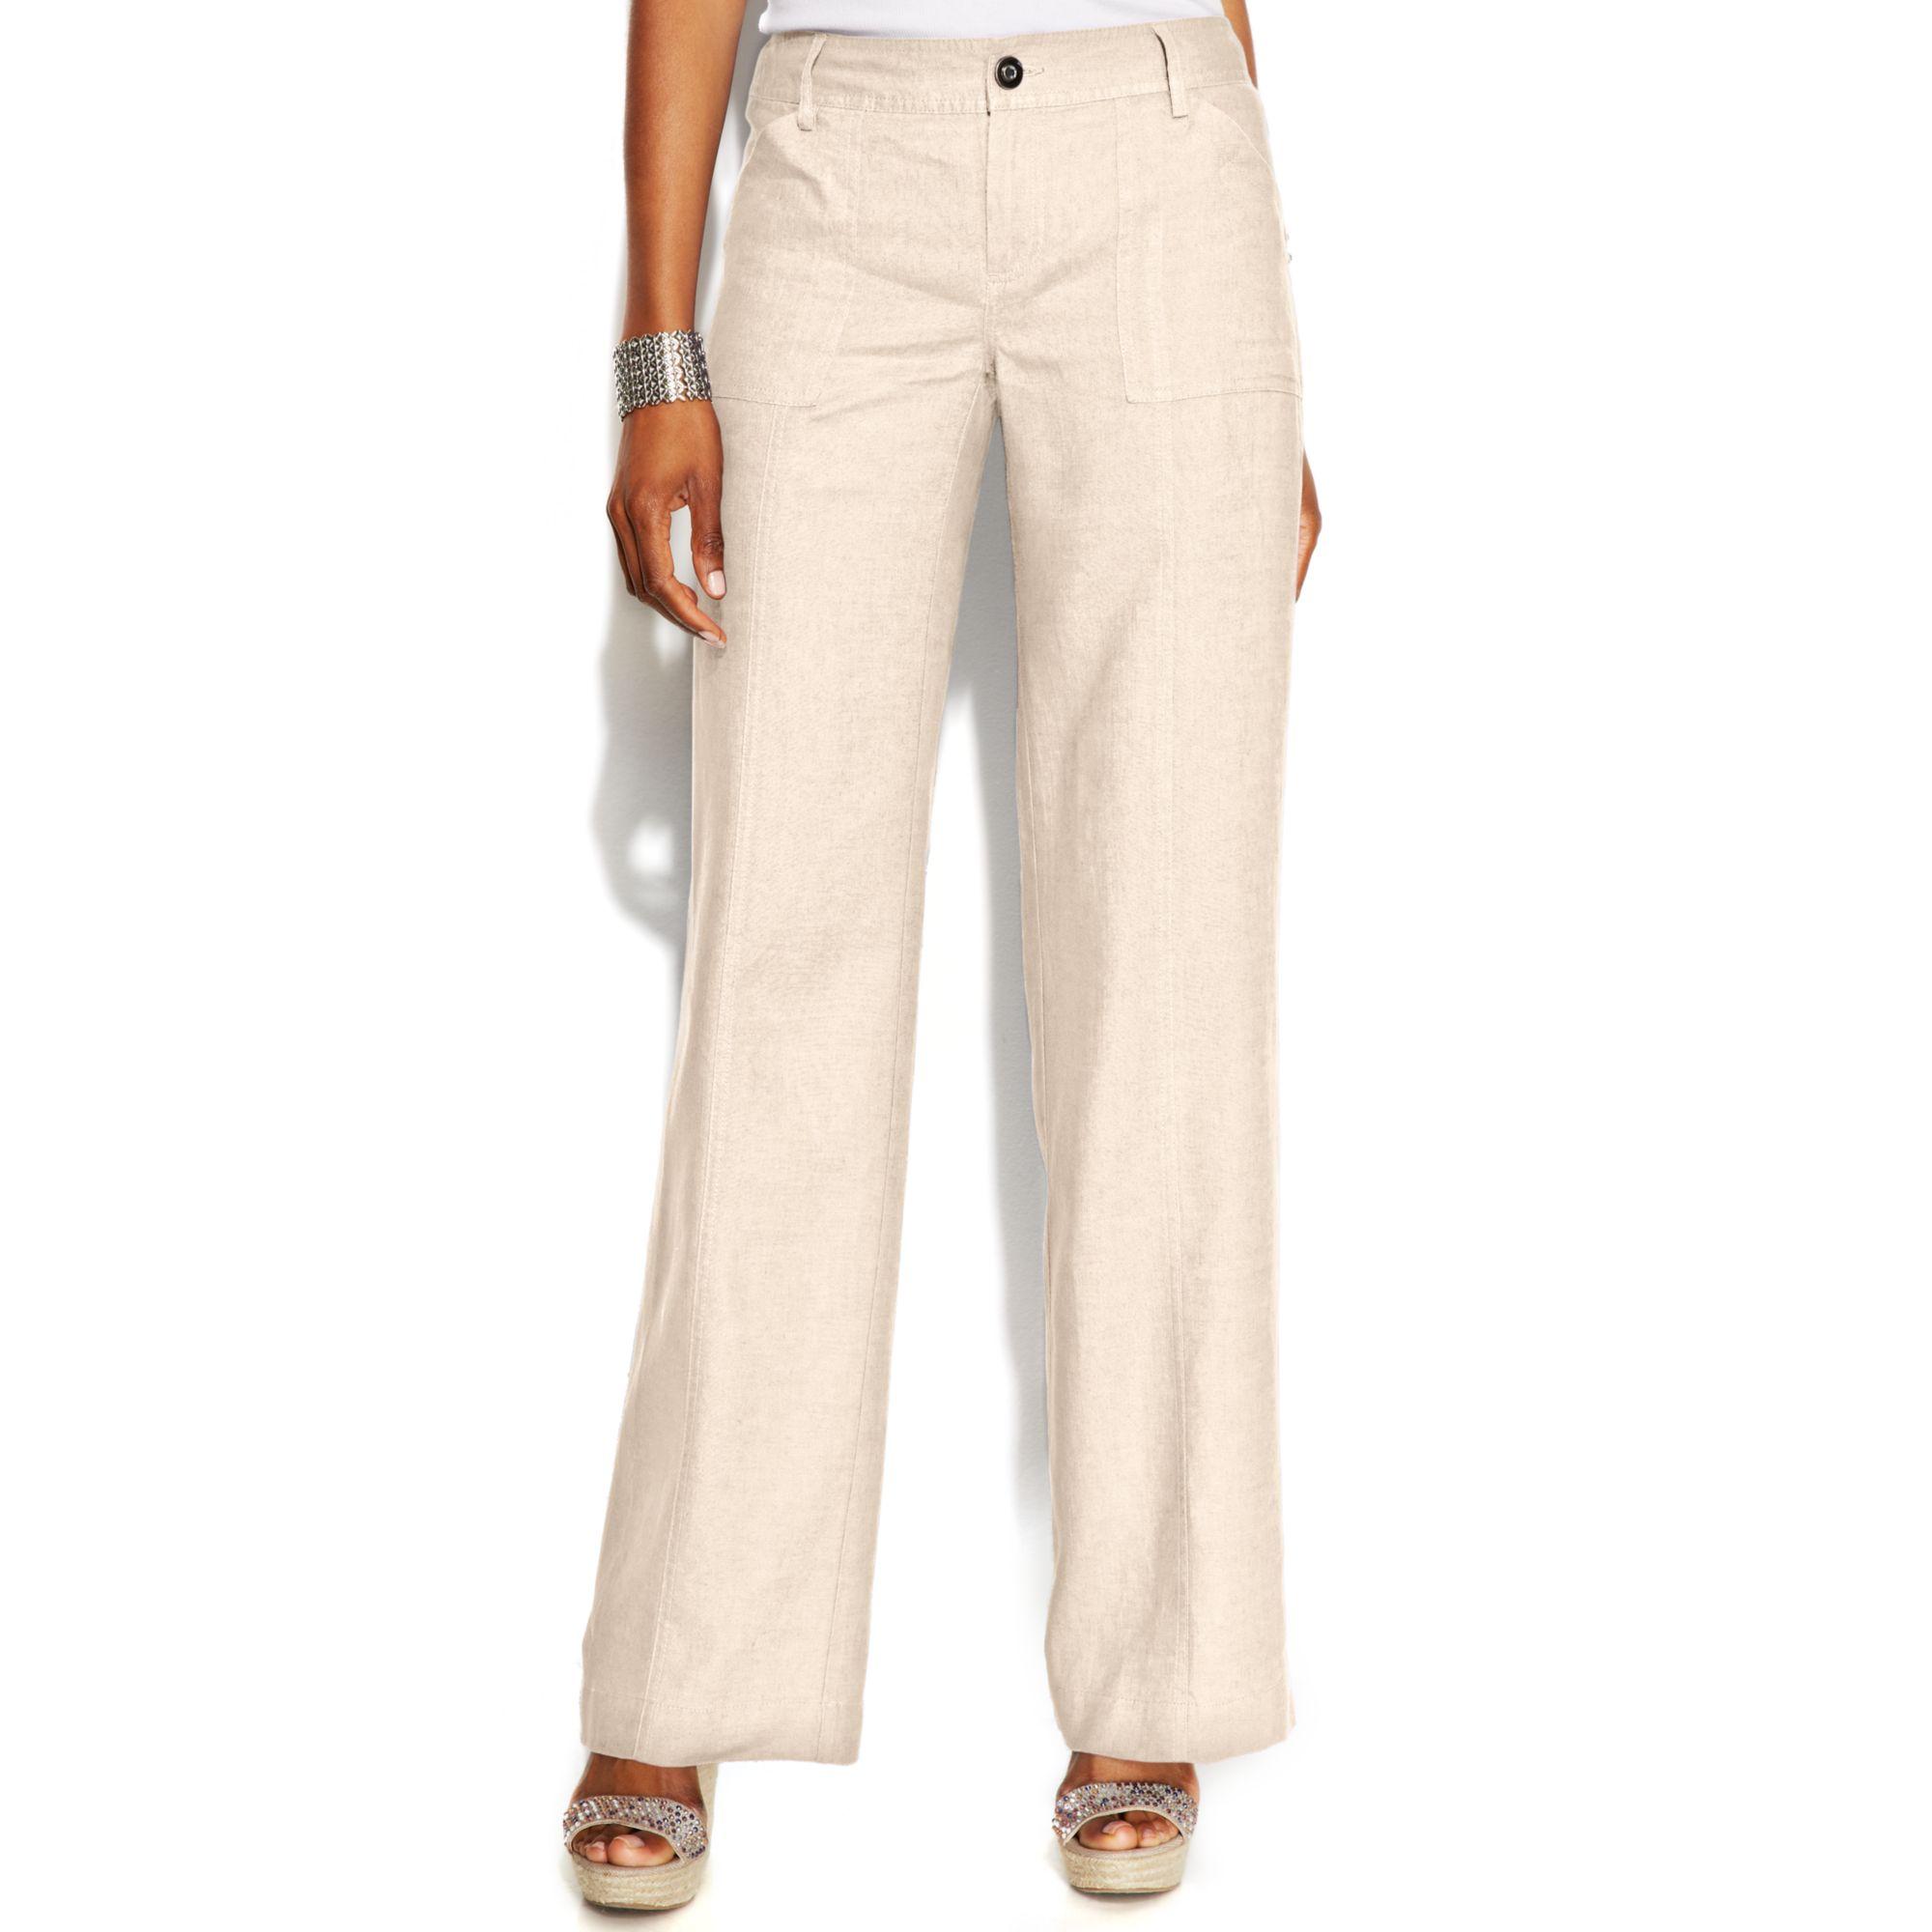 Elegant Beige Flared Linen Pants  Women  Zulily